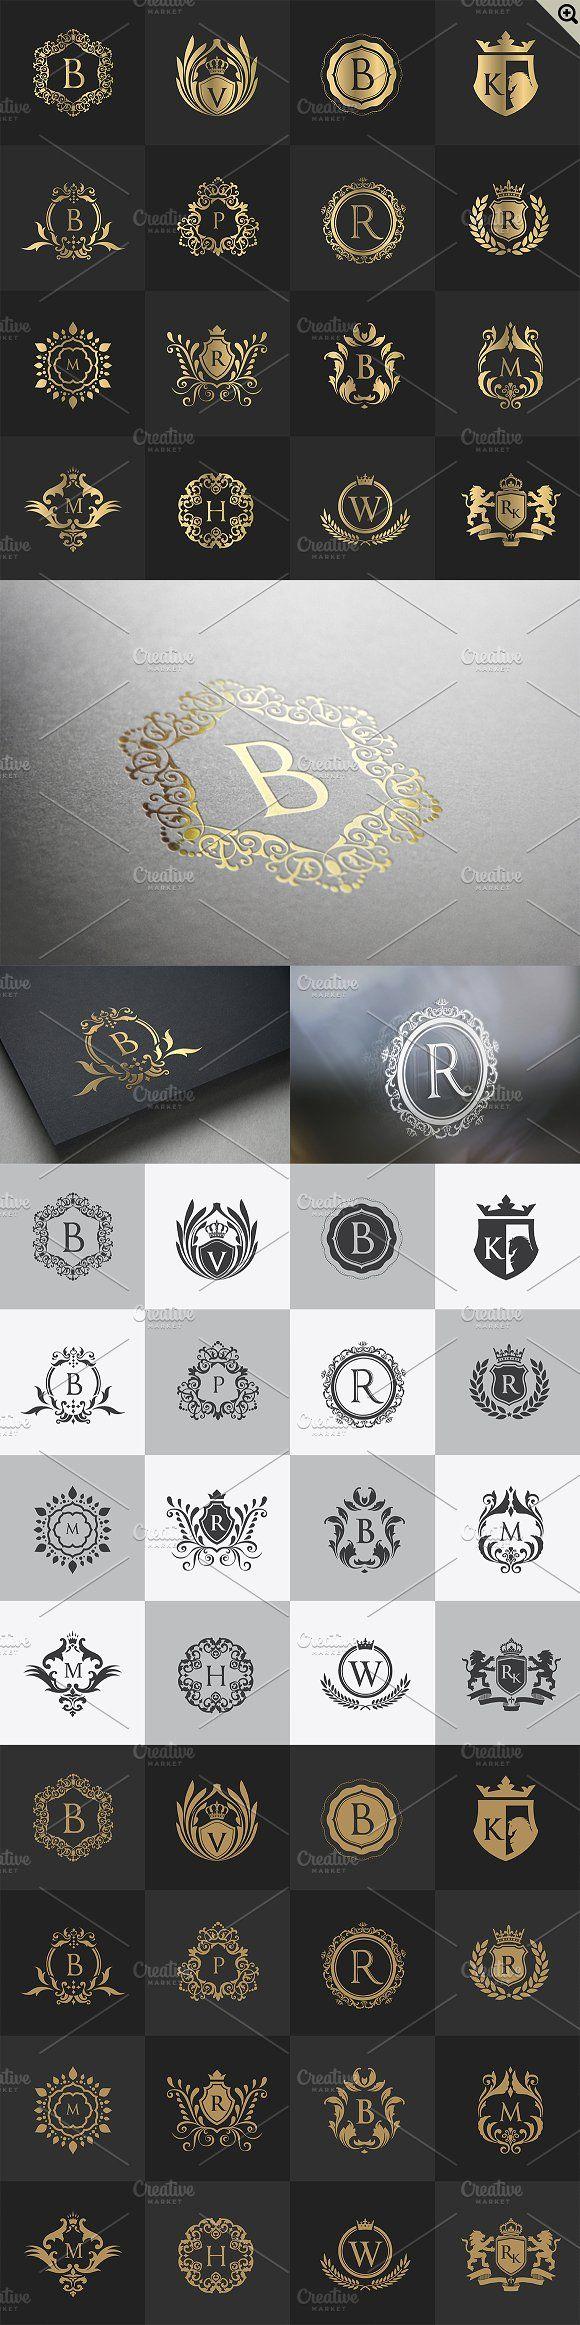 32 Luxury logo set by Super Pig Shop on @creativemarket